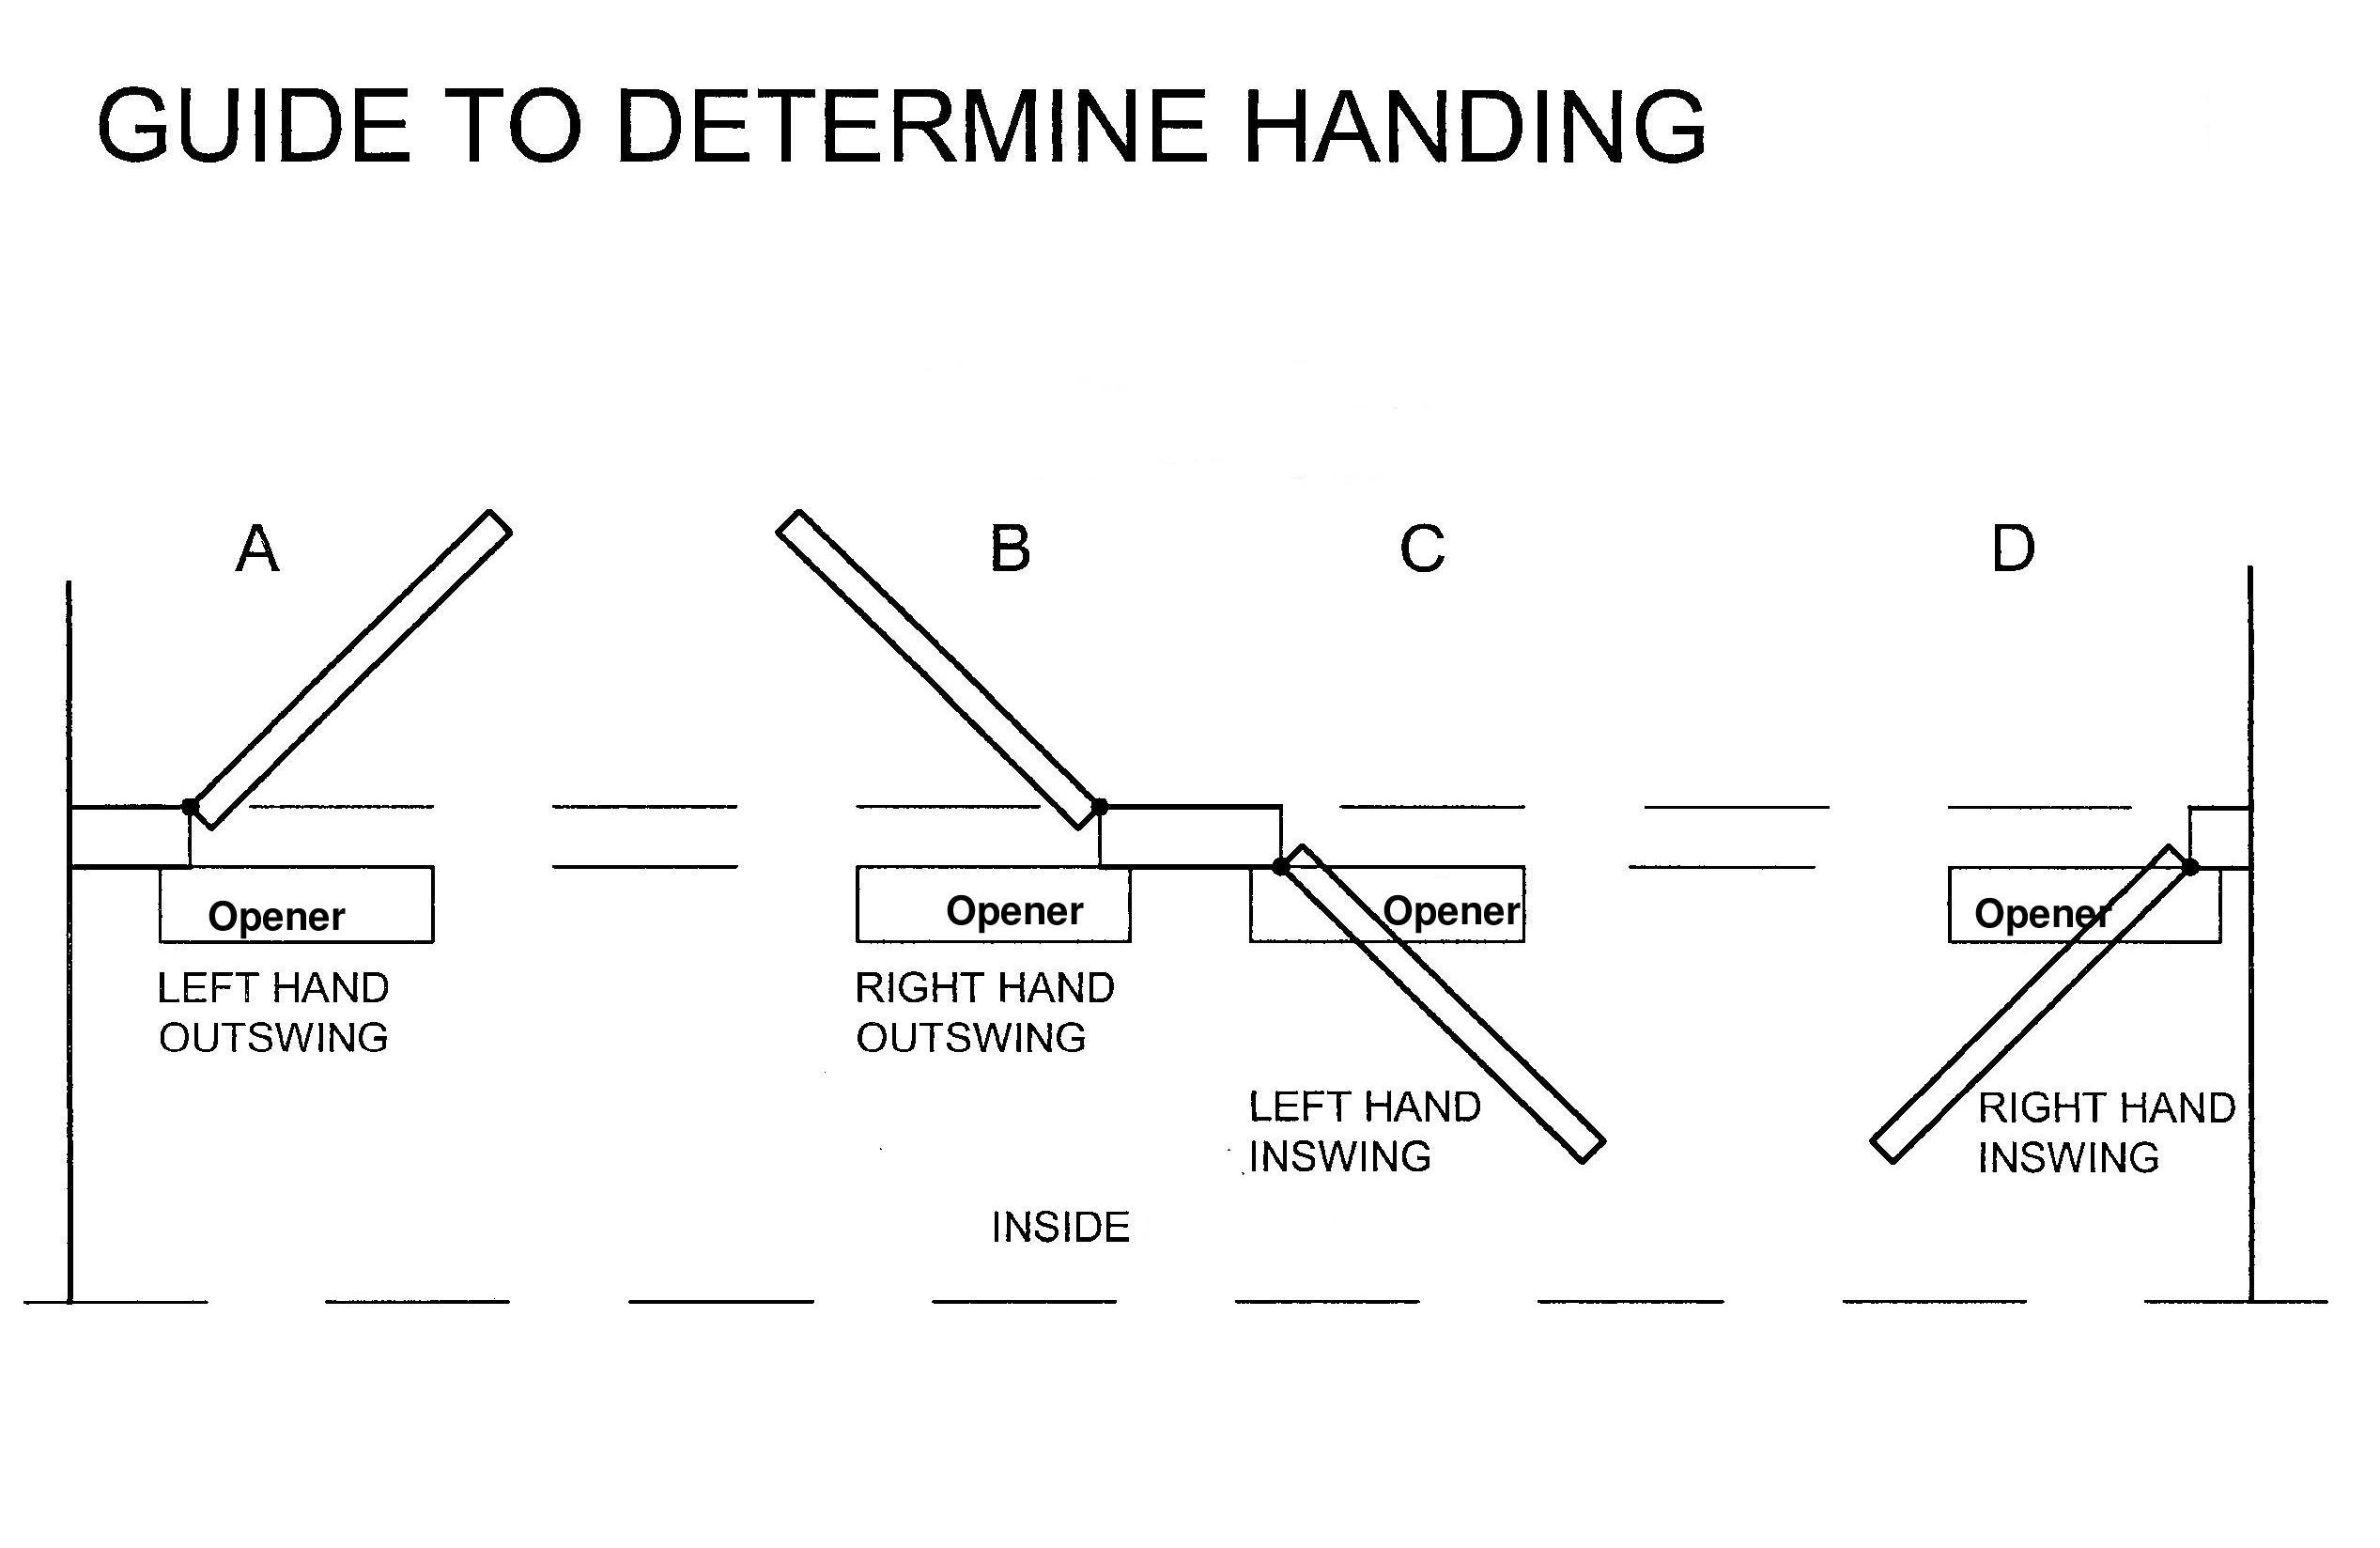 handing-form-cp-revised.jpg